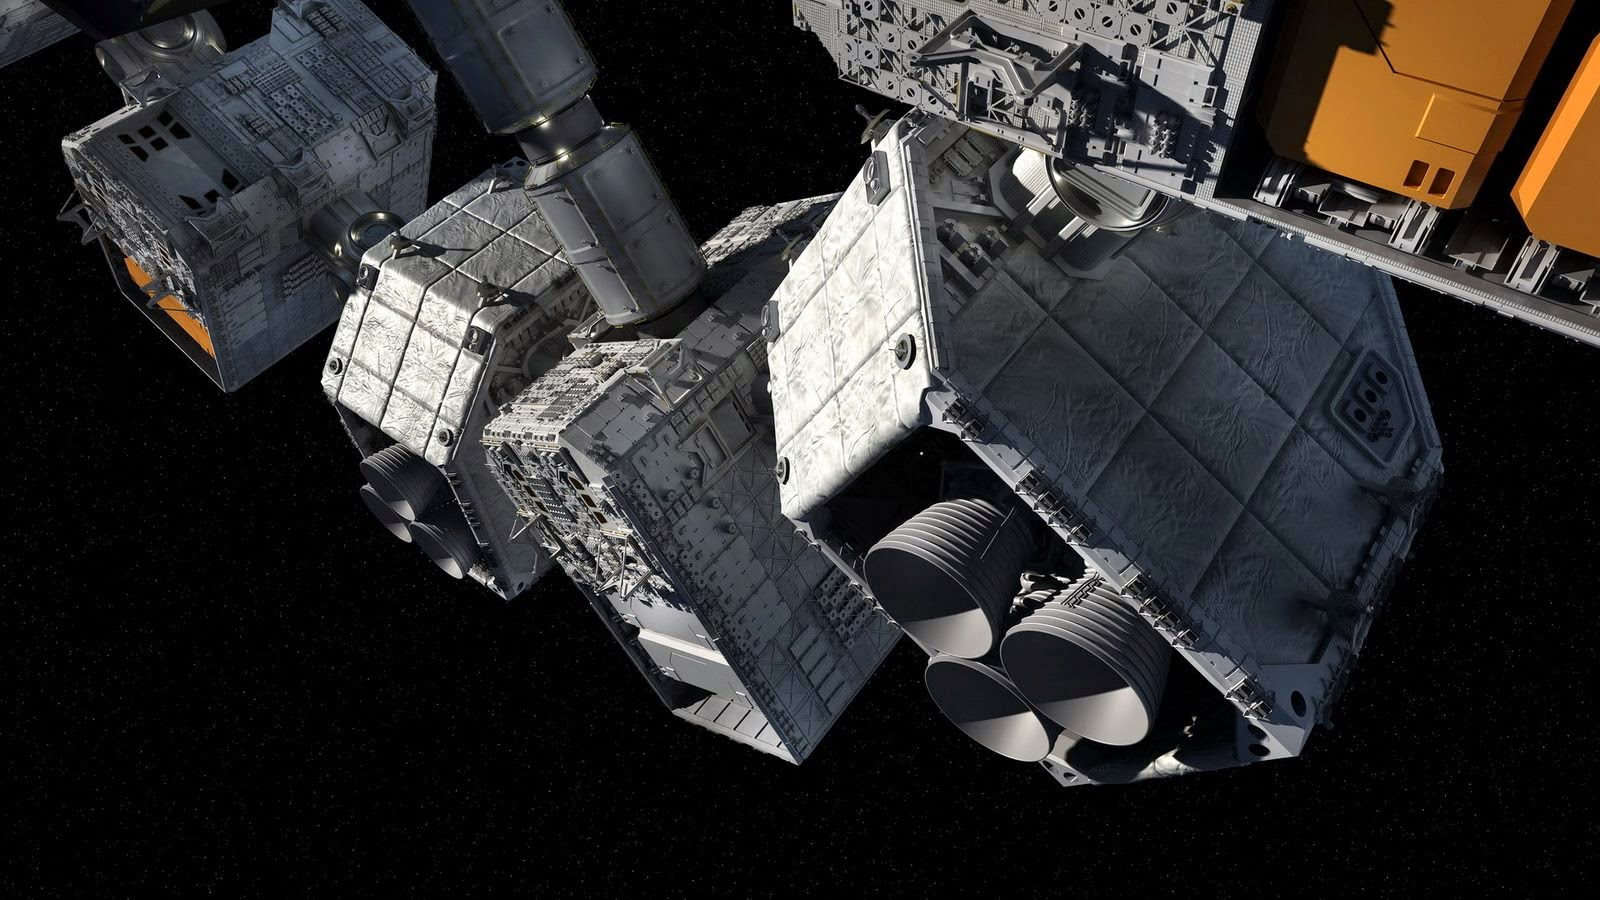 Soaring INTERSTELLAR Spaceship Concept Art by Steve Burg